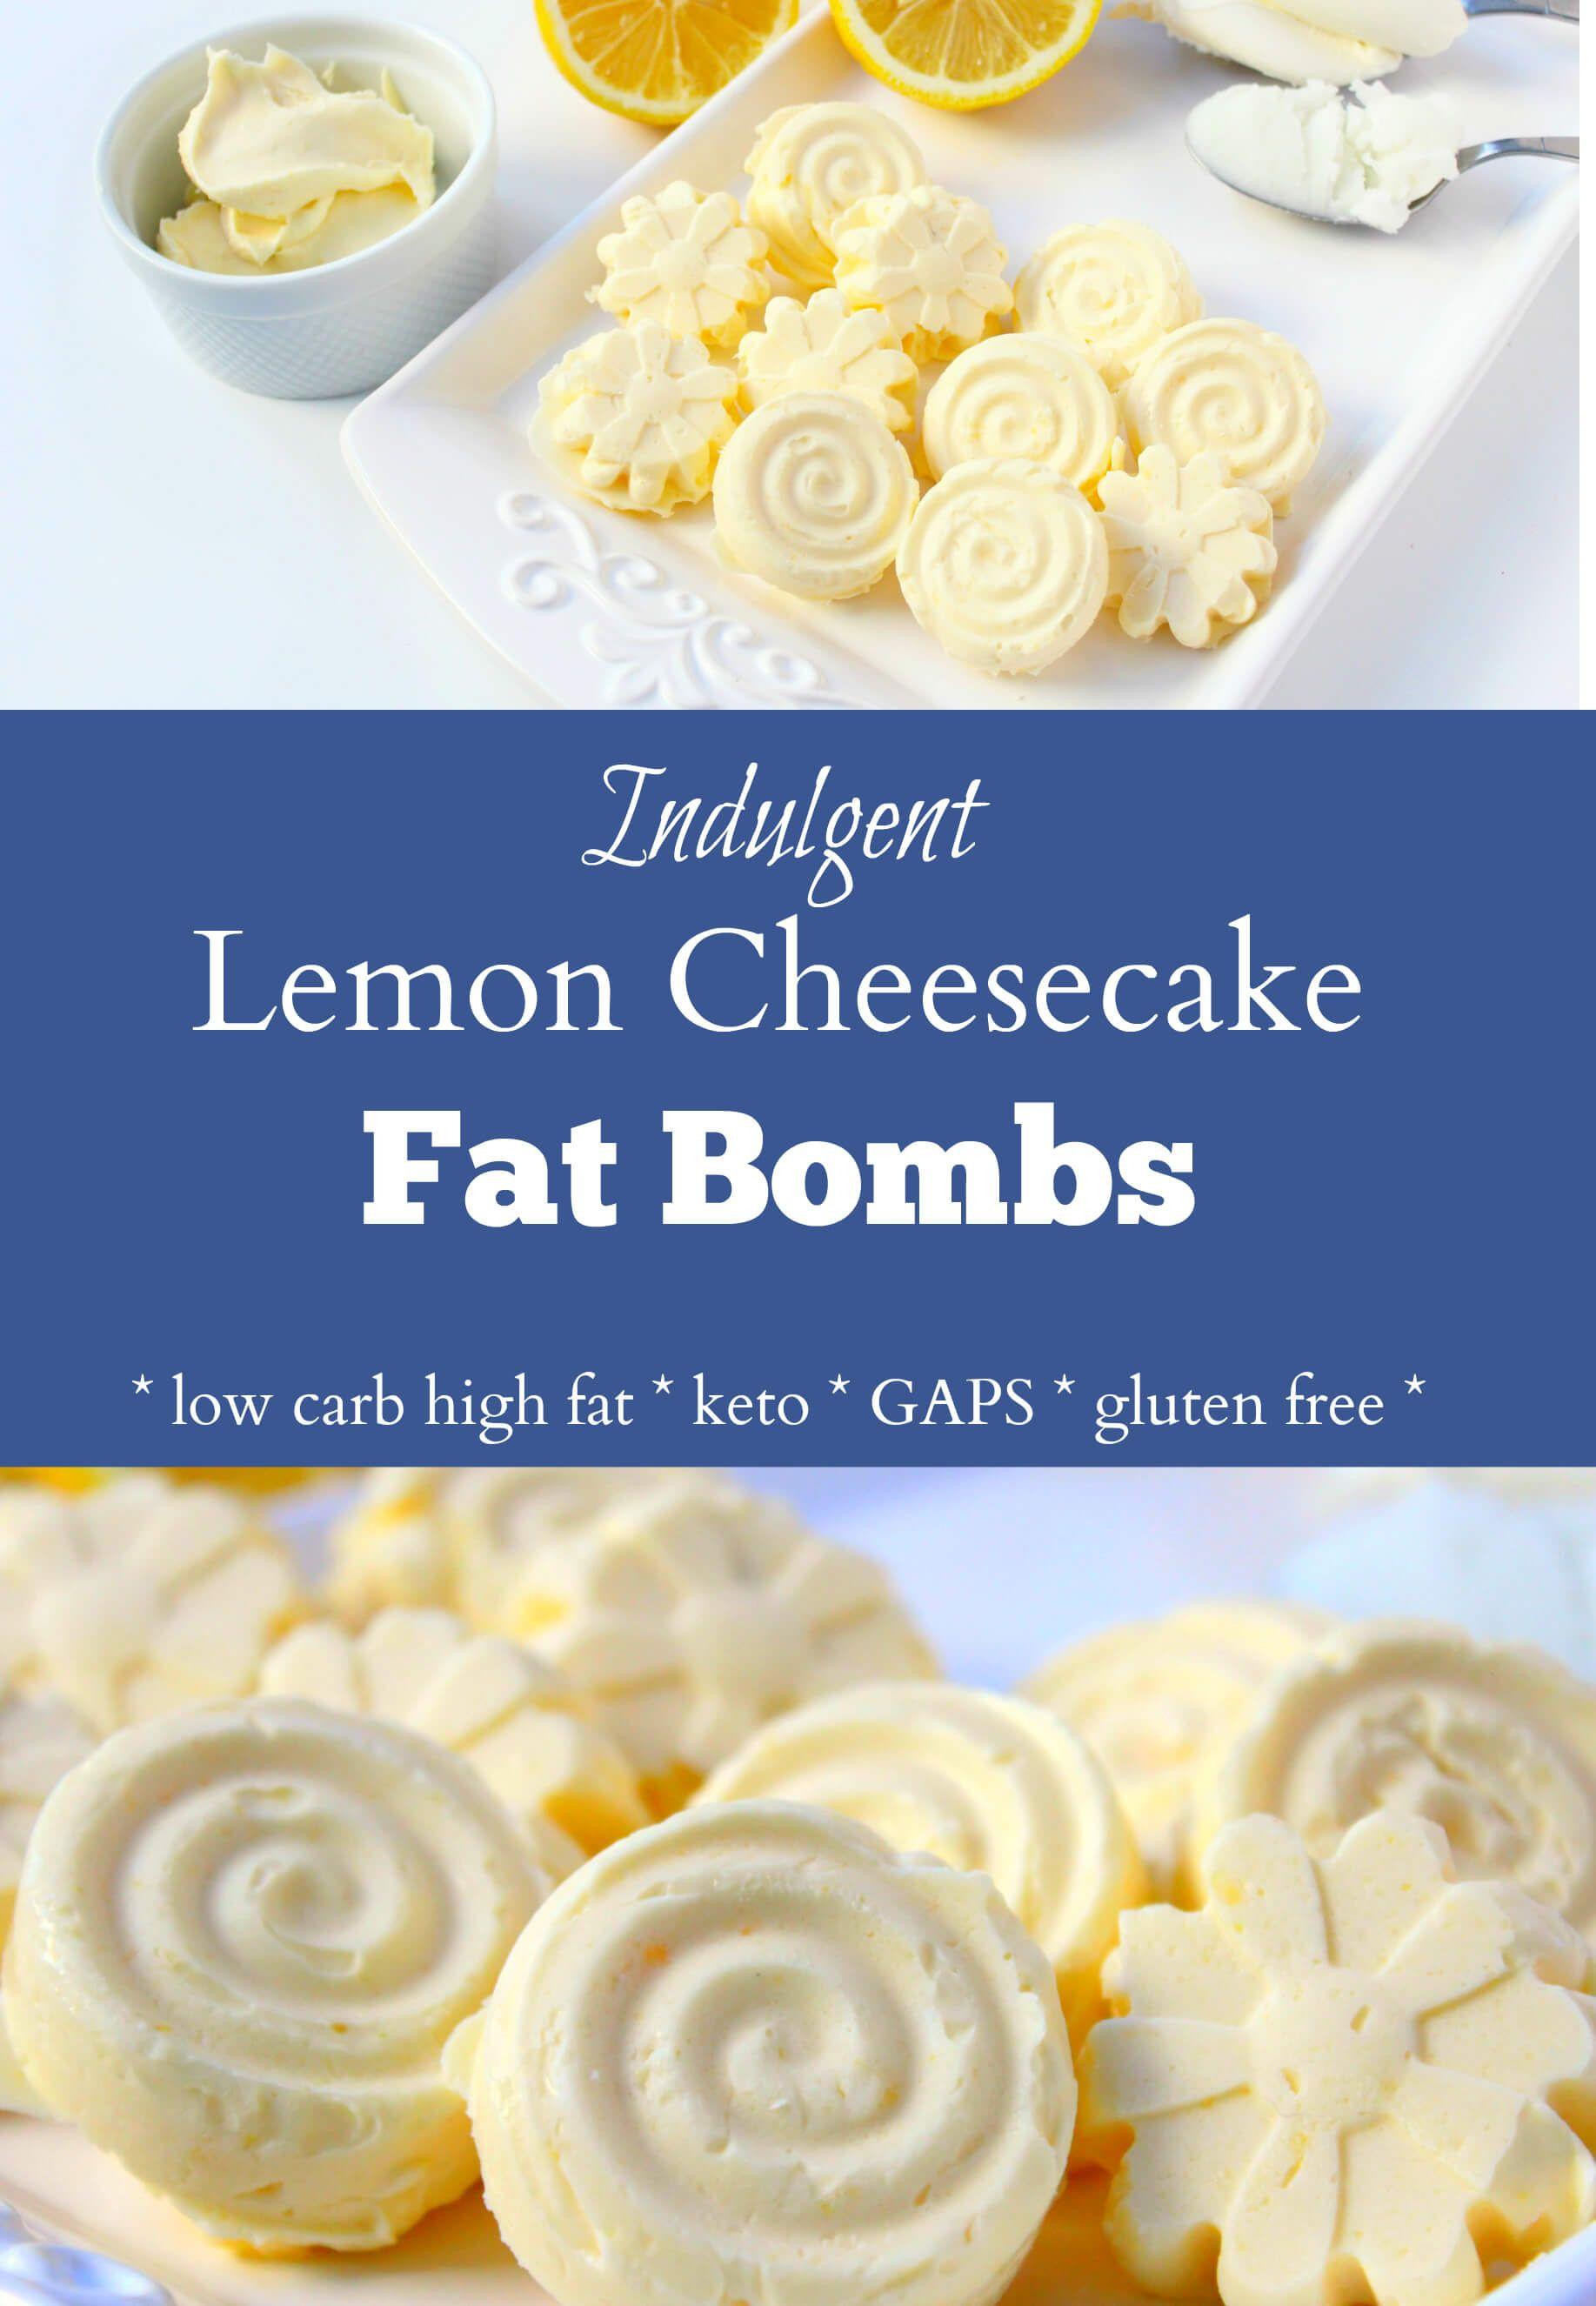 Decadent Lemon Cheesecake Fat Bombs Low Carb Keto Gaps